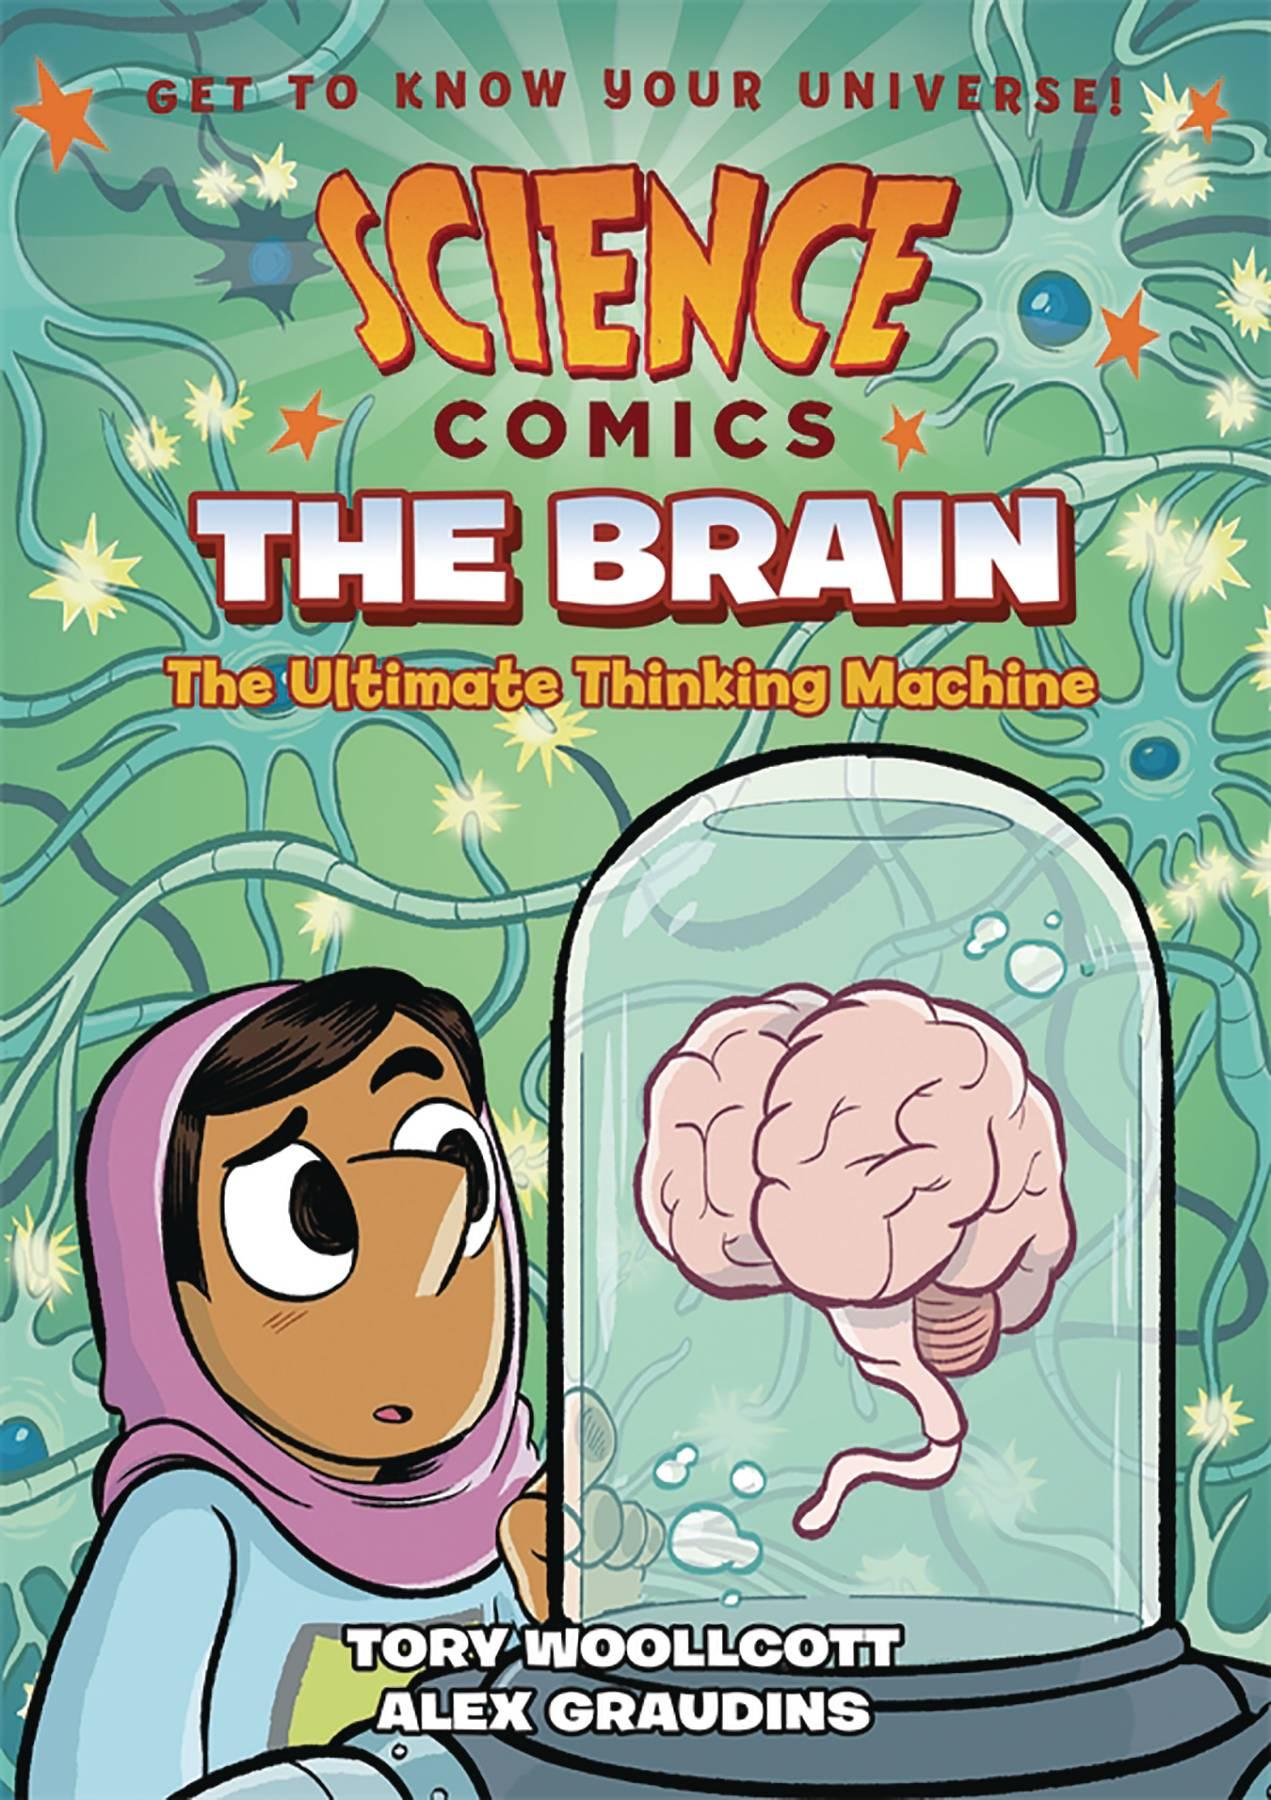 SCIENCE COMICS THE BRAIN